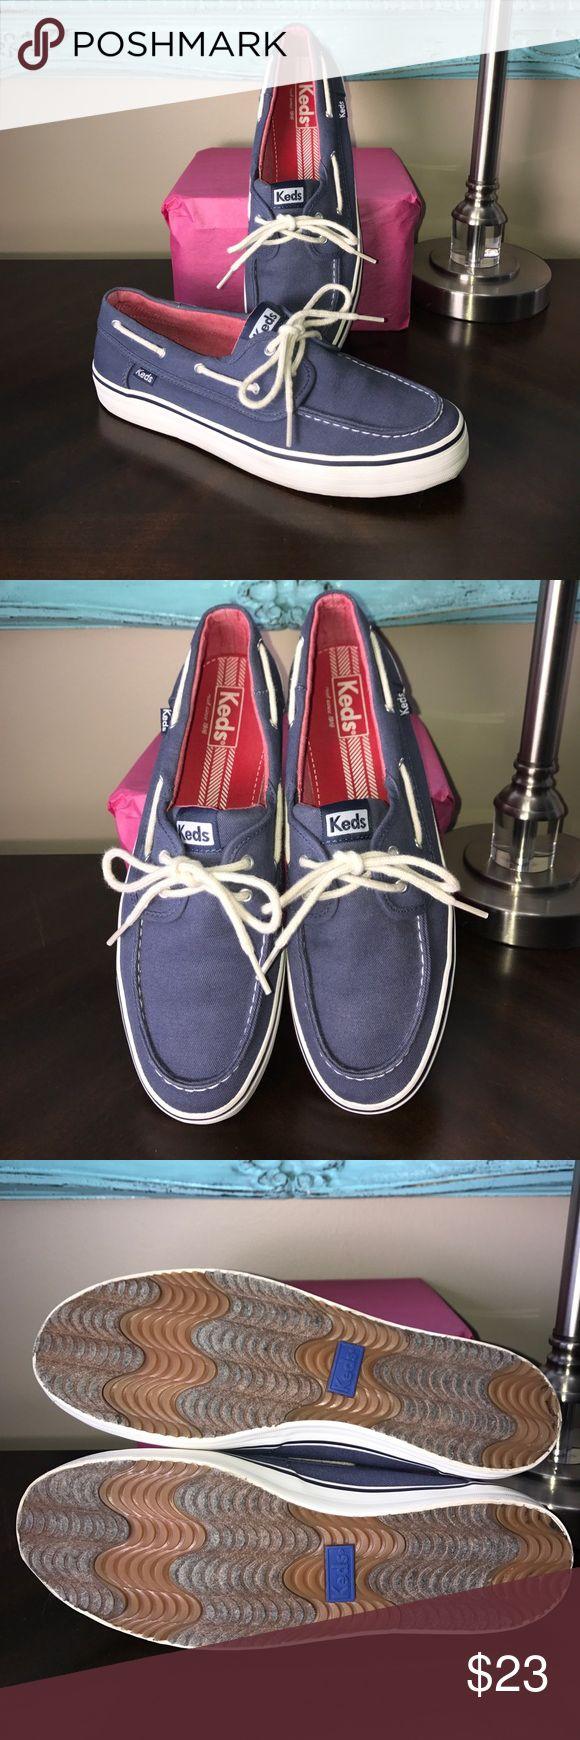 🎉EUC🎉 Navy Keds Boat Shoes 🎉❤️Like new❤️🎉 Worn once! Size 10 Keds Shoes